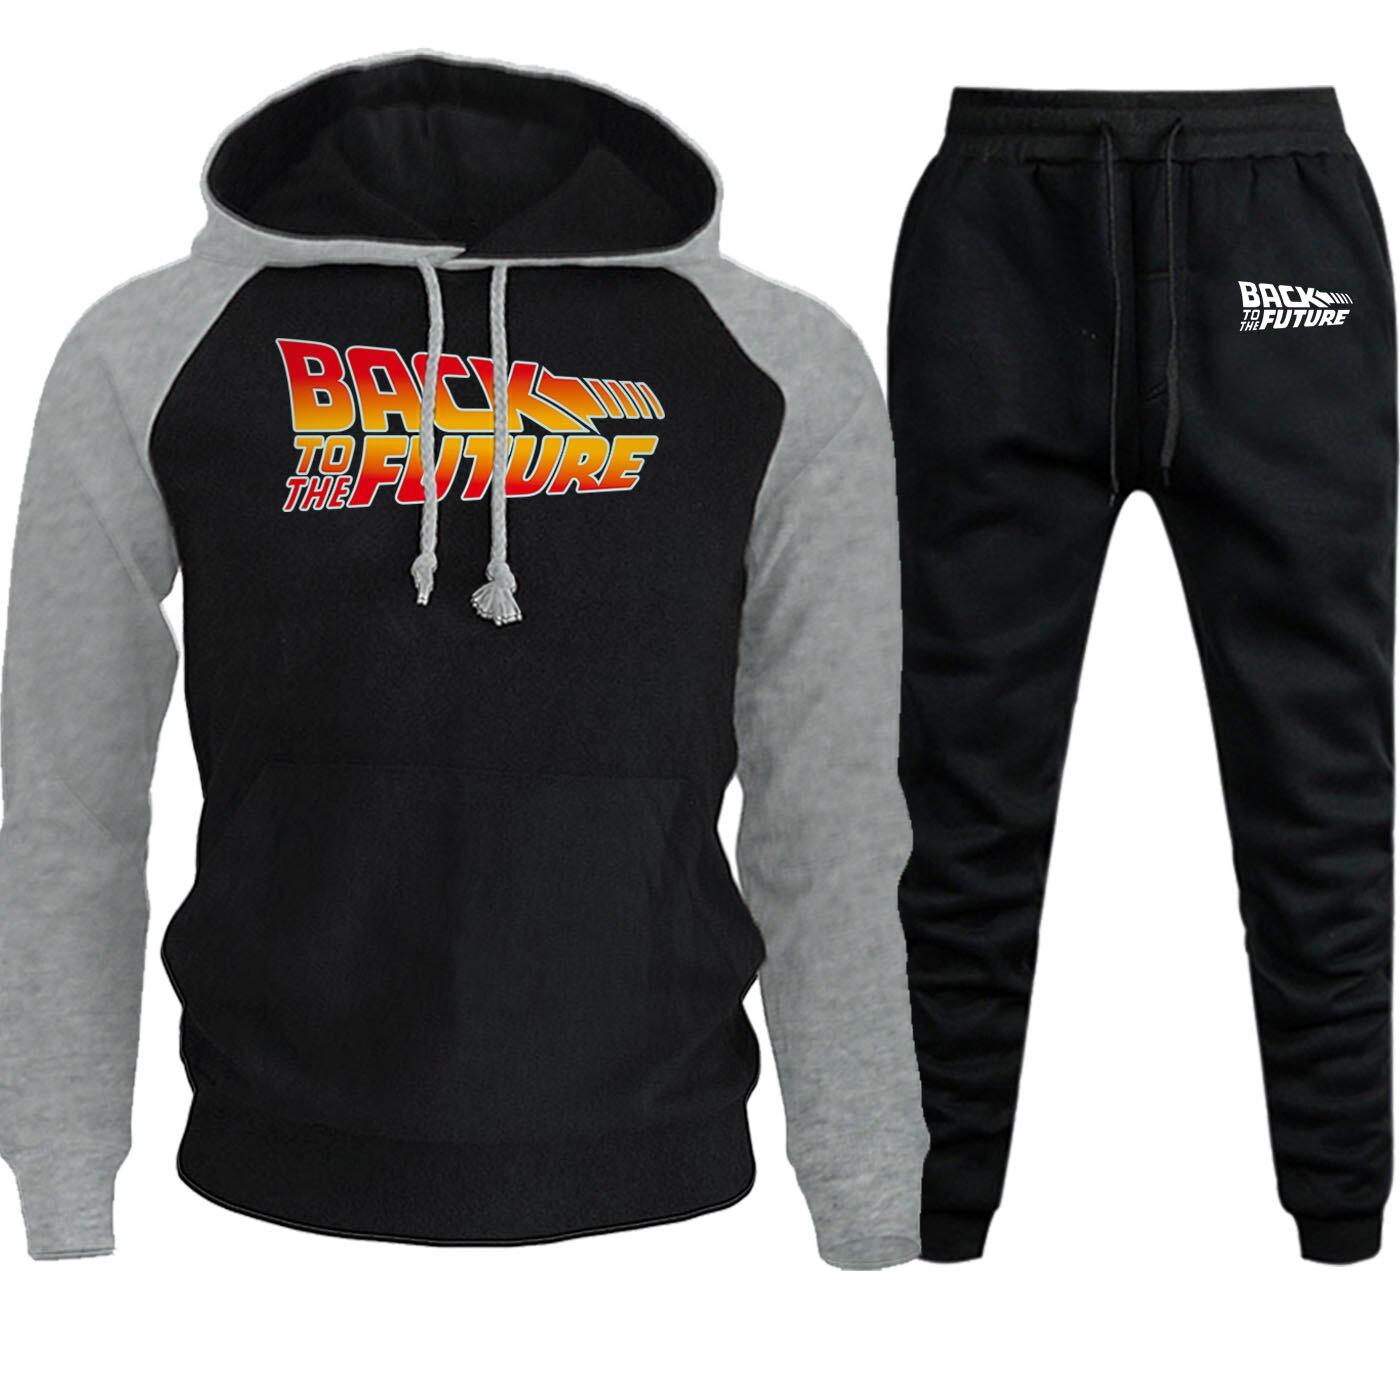 Men Raglan Hooded Sweatshirts Back To The Future Autumn Winter 2019 Suit Male Fleece Hoodies Fashion Pullover+Pants 2 Piece Set